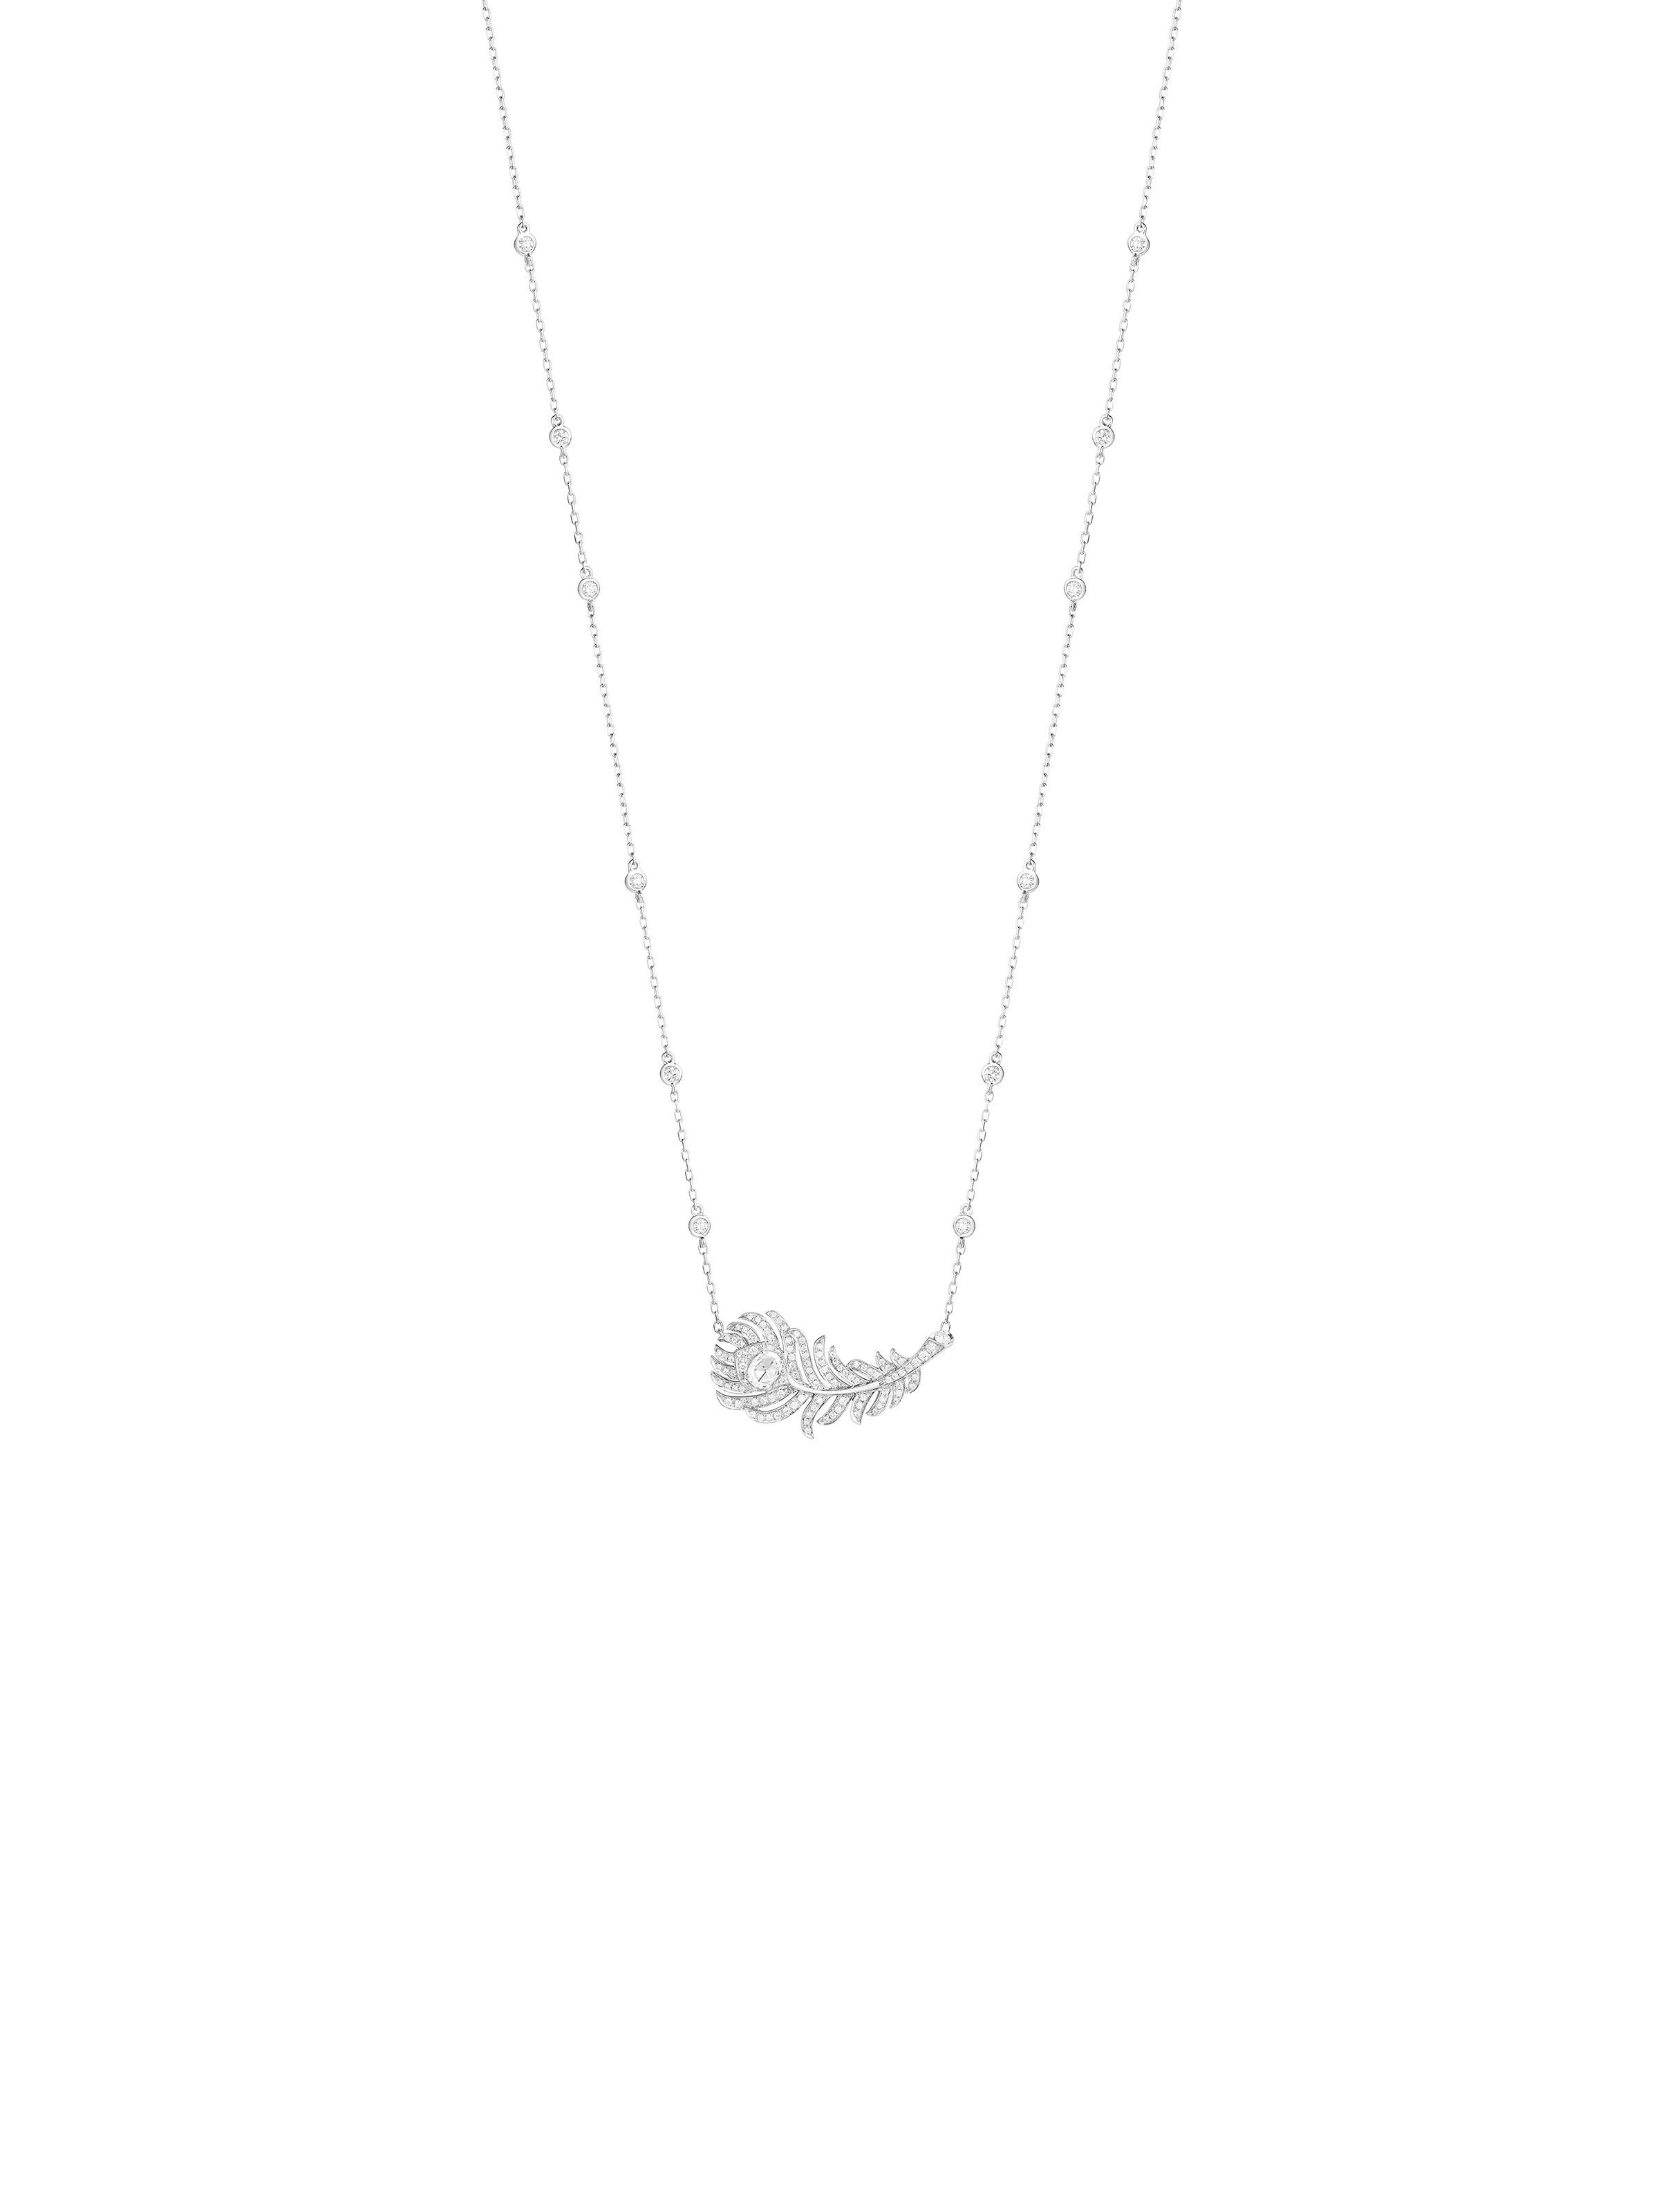 Nature Triomphante necklace